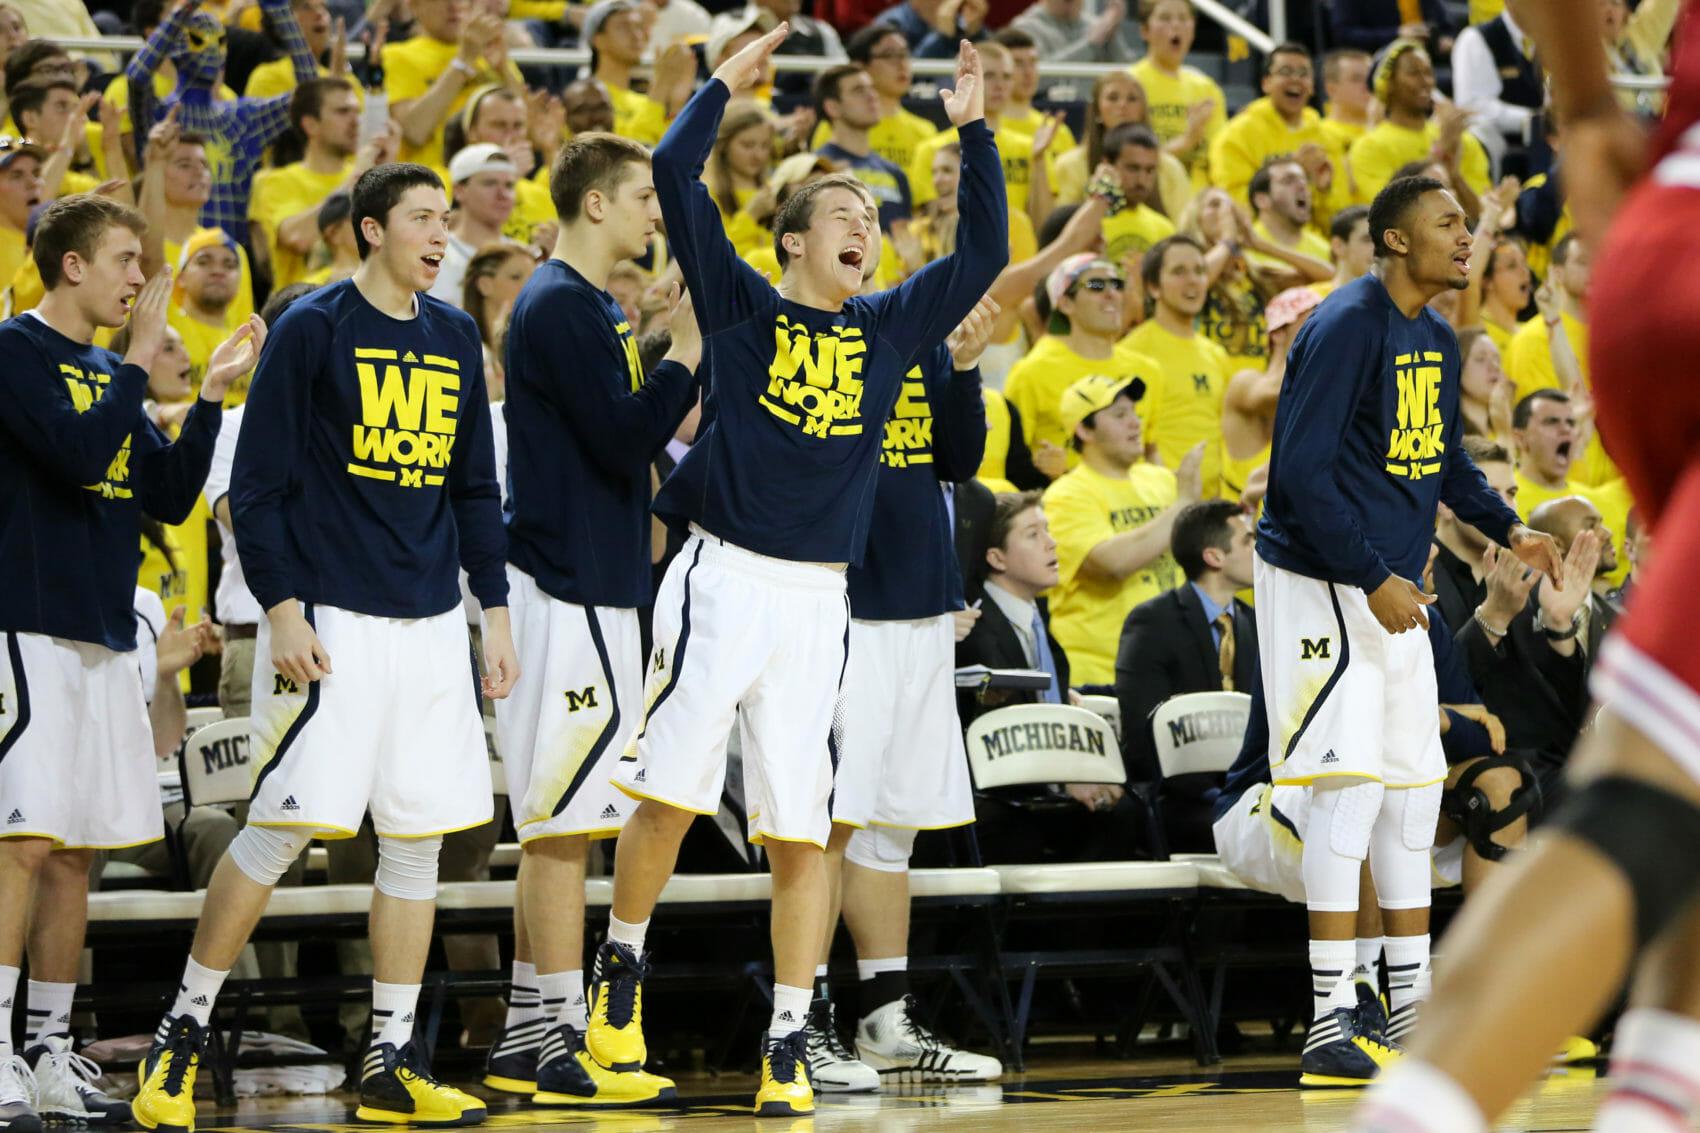 Michigan bench mob-6